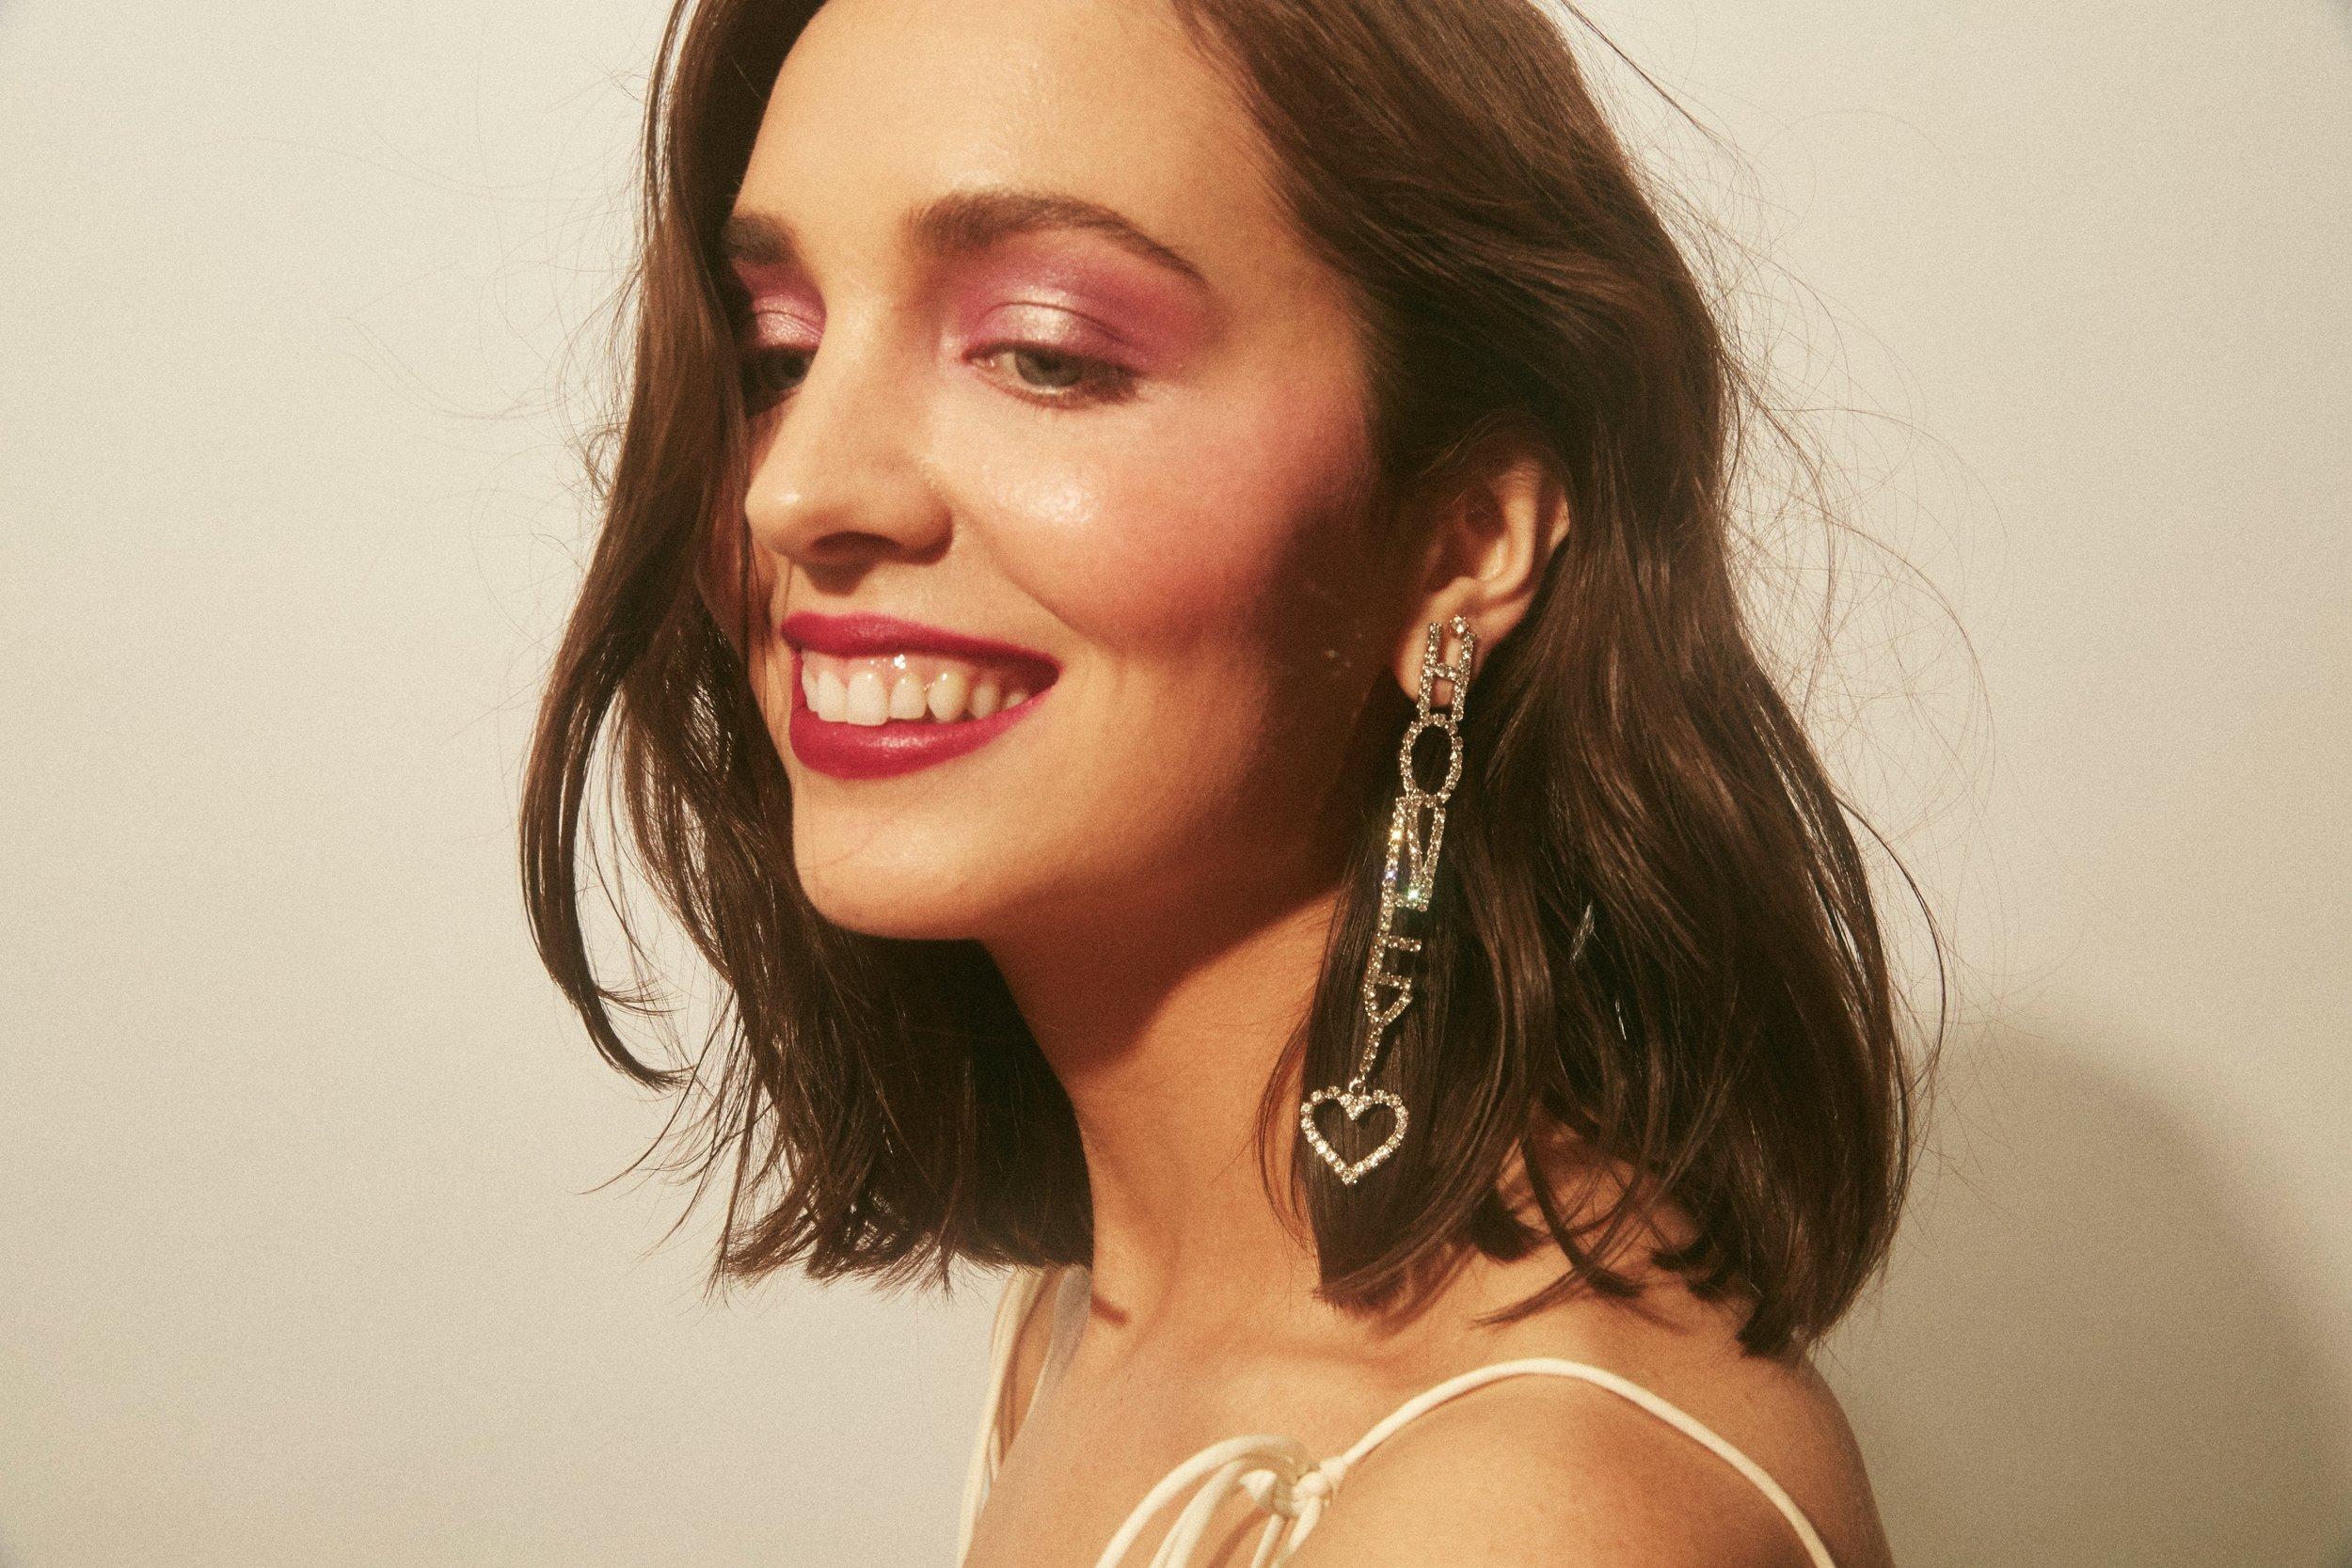 Pat McGrath labs YSL beauty 2019 trend makeup skincare